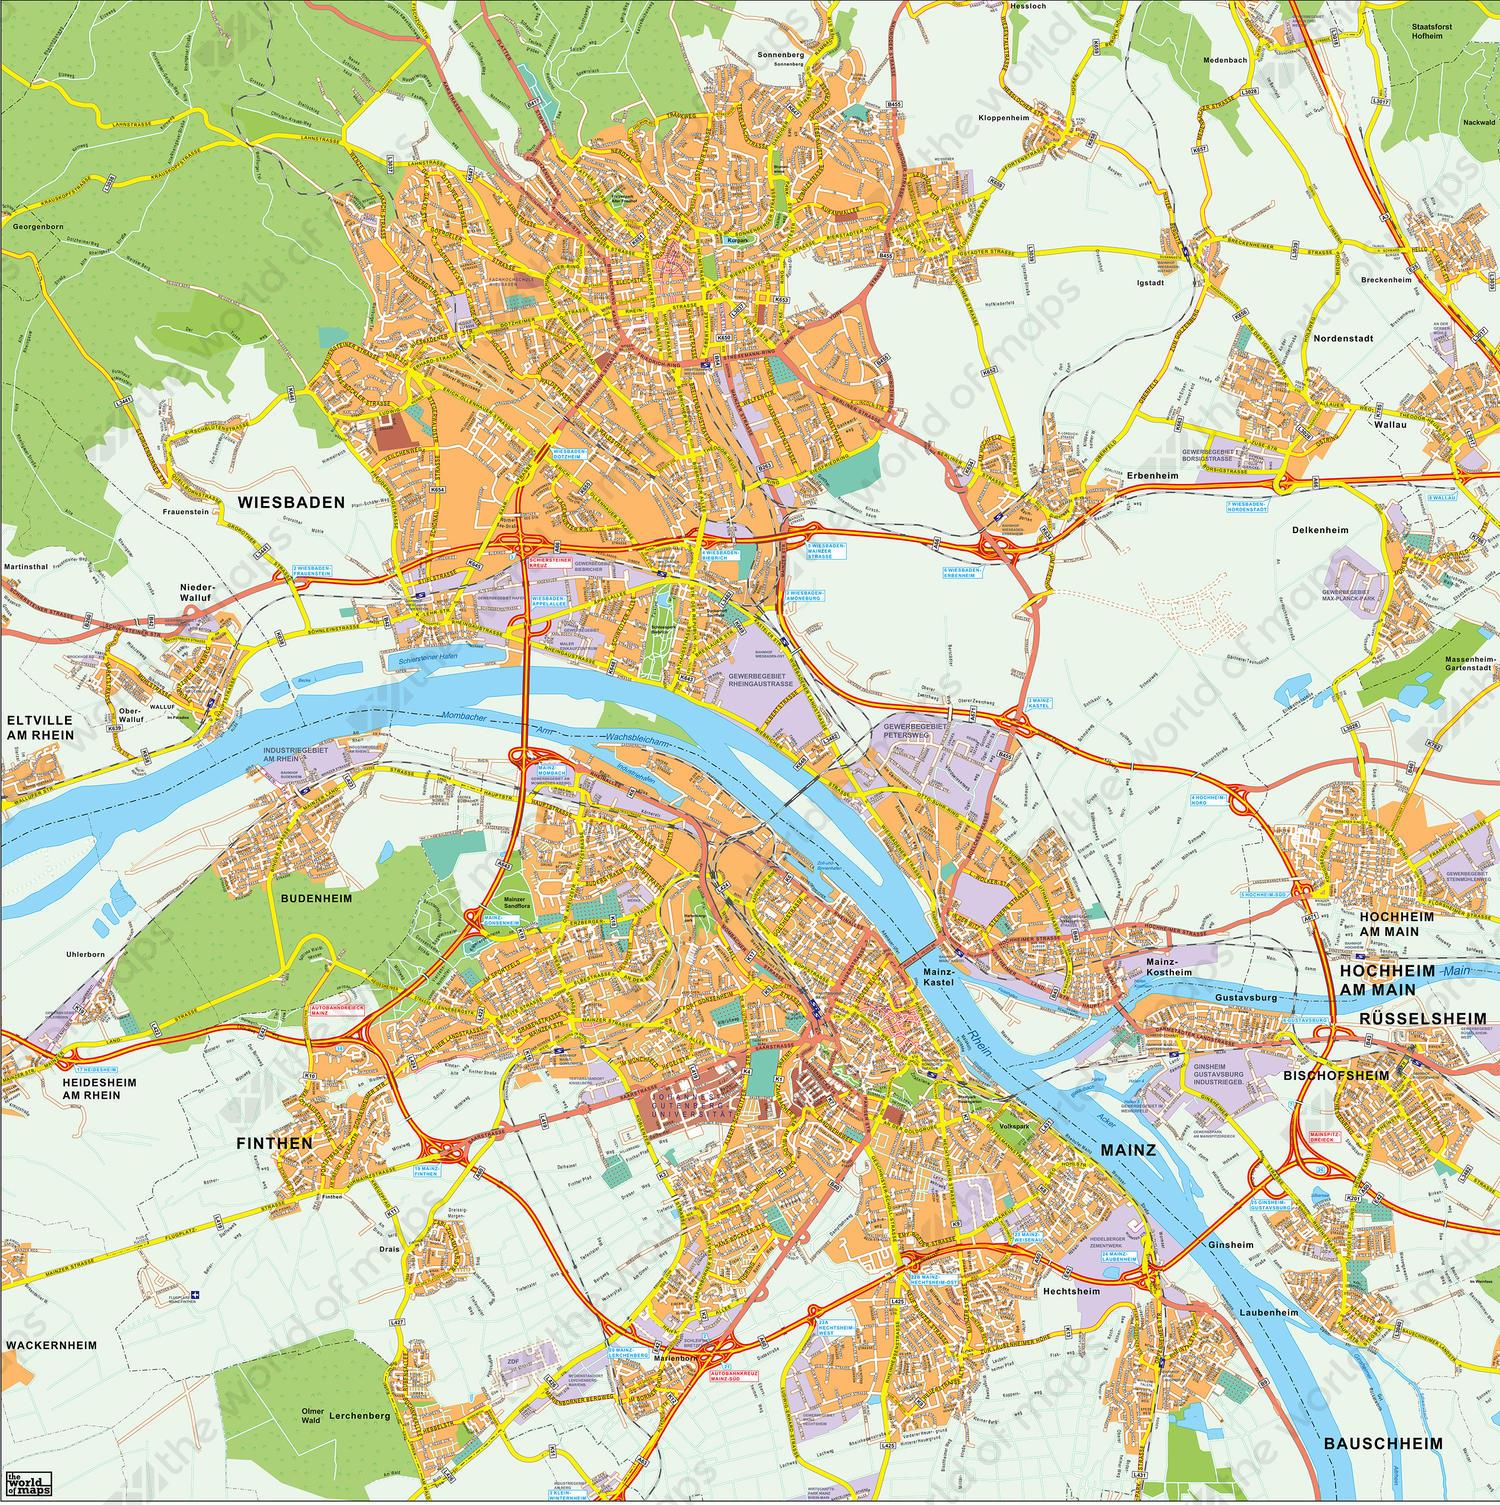 Digital City Map WiesbadenMainz 177 The World of Mapscom